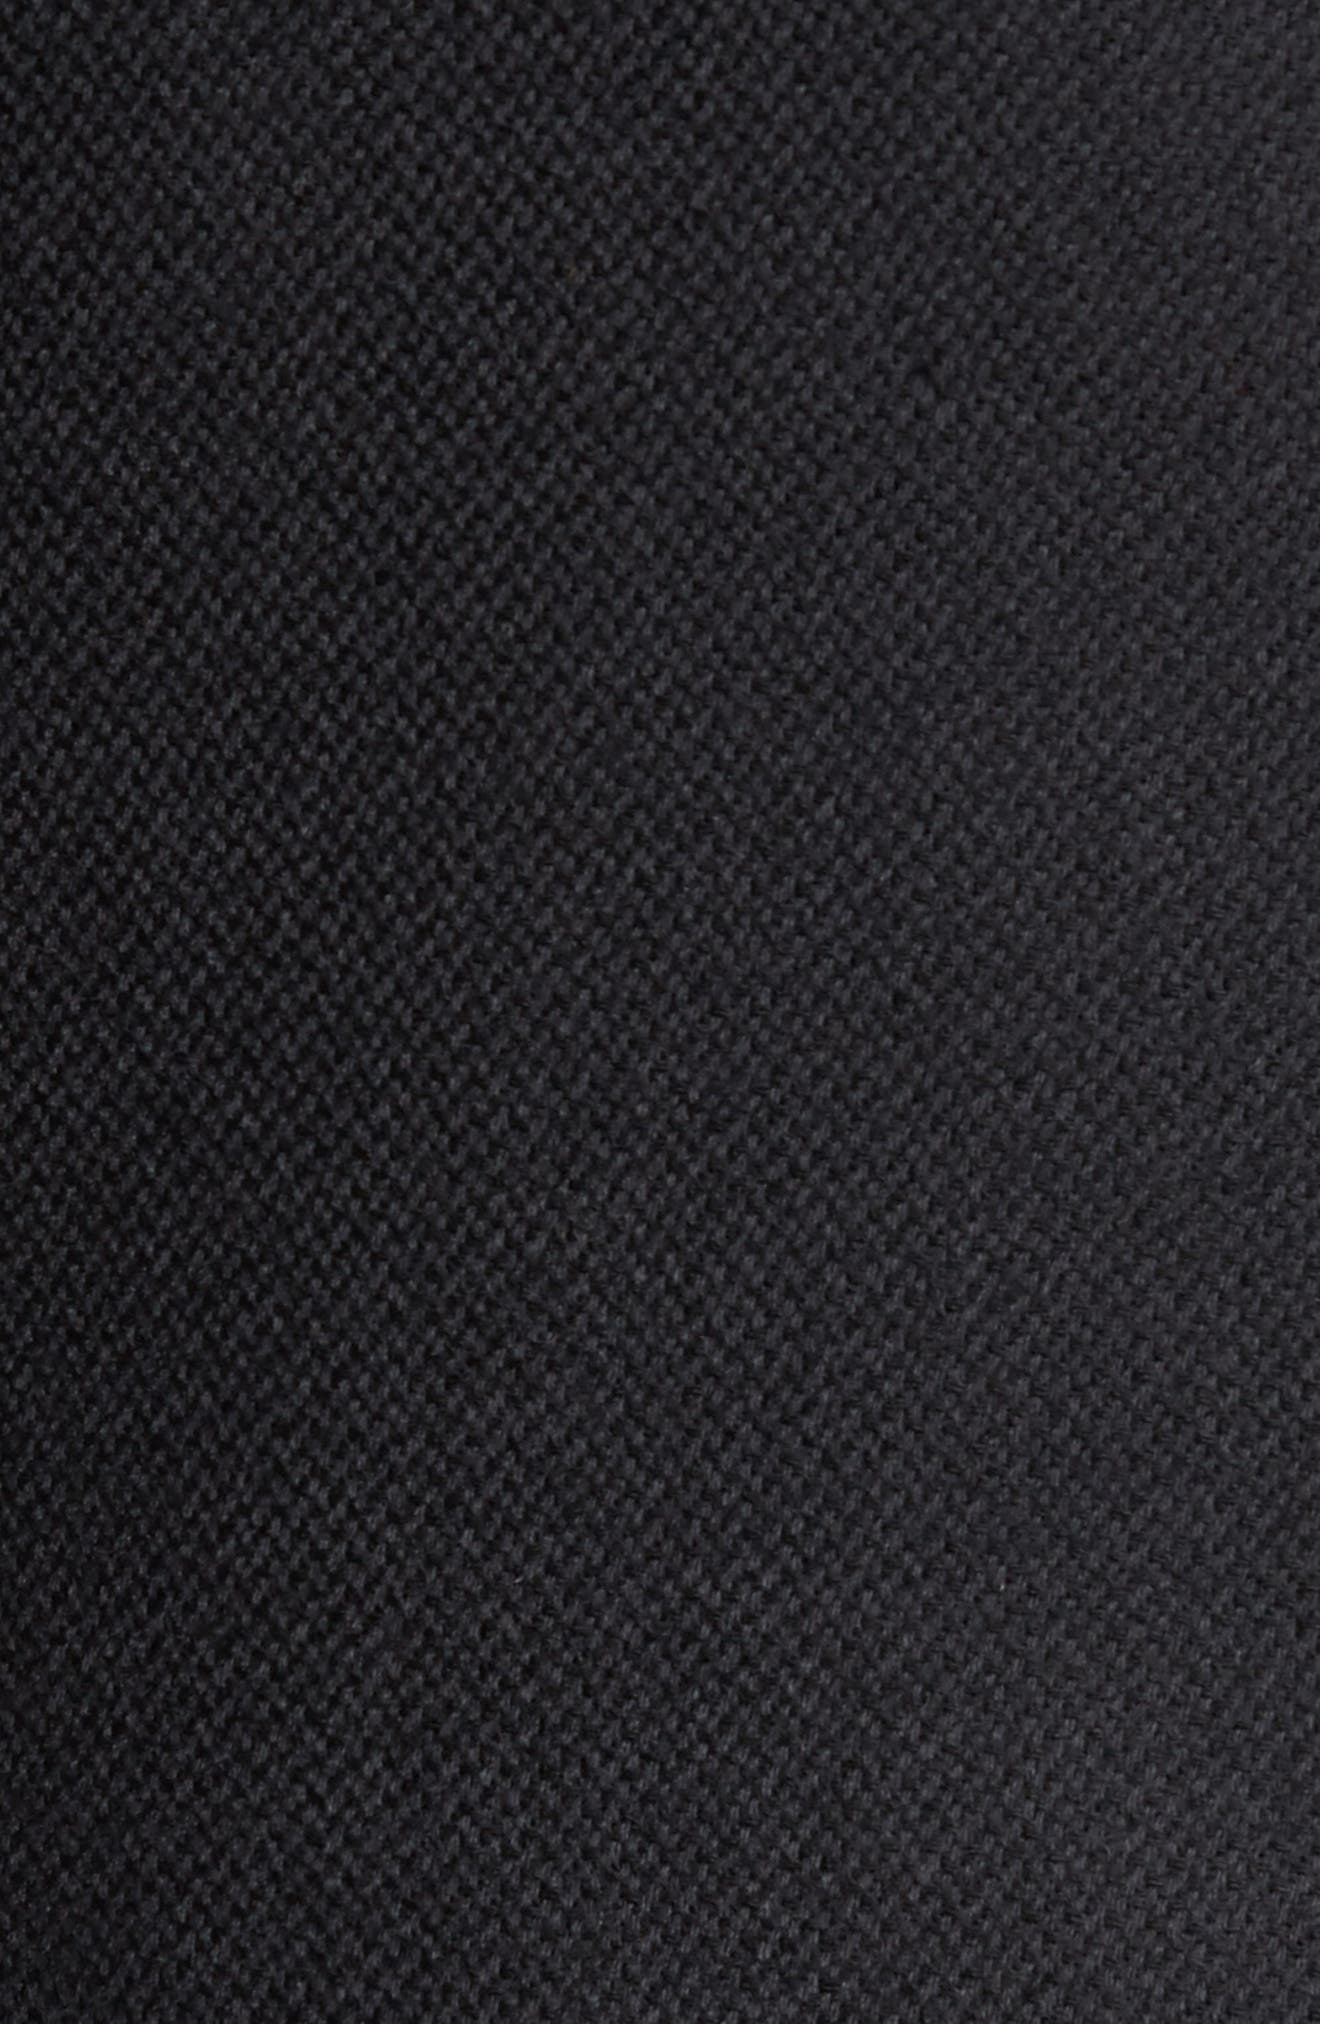 Classic Fit Wool & Cashmere Hybrid Coat,                             Alternate thumbnail 6, color,                             001